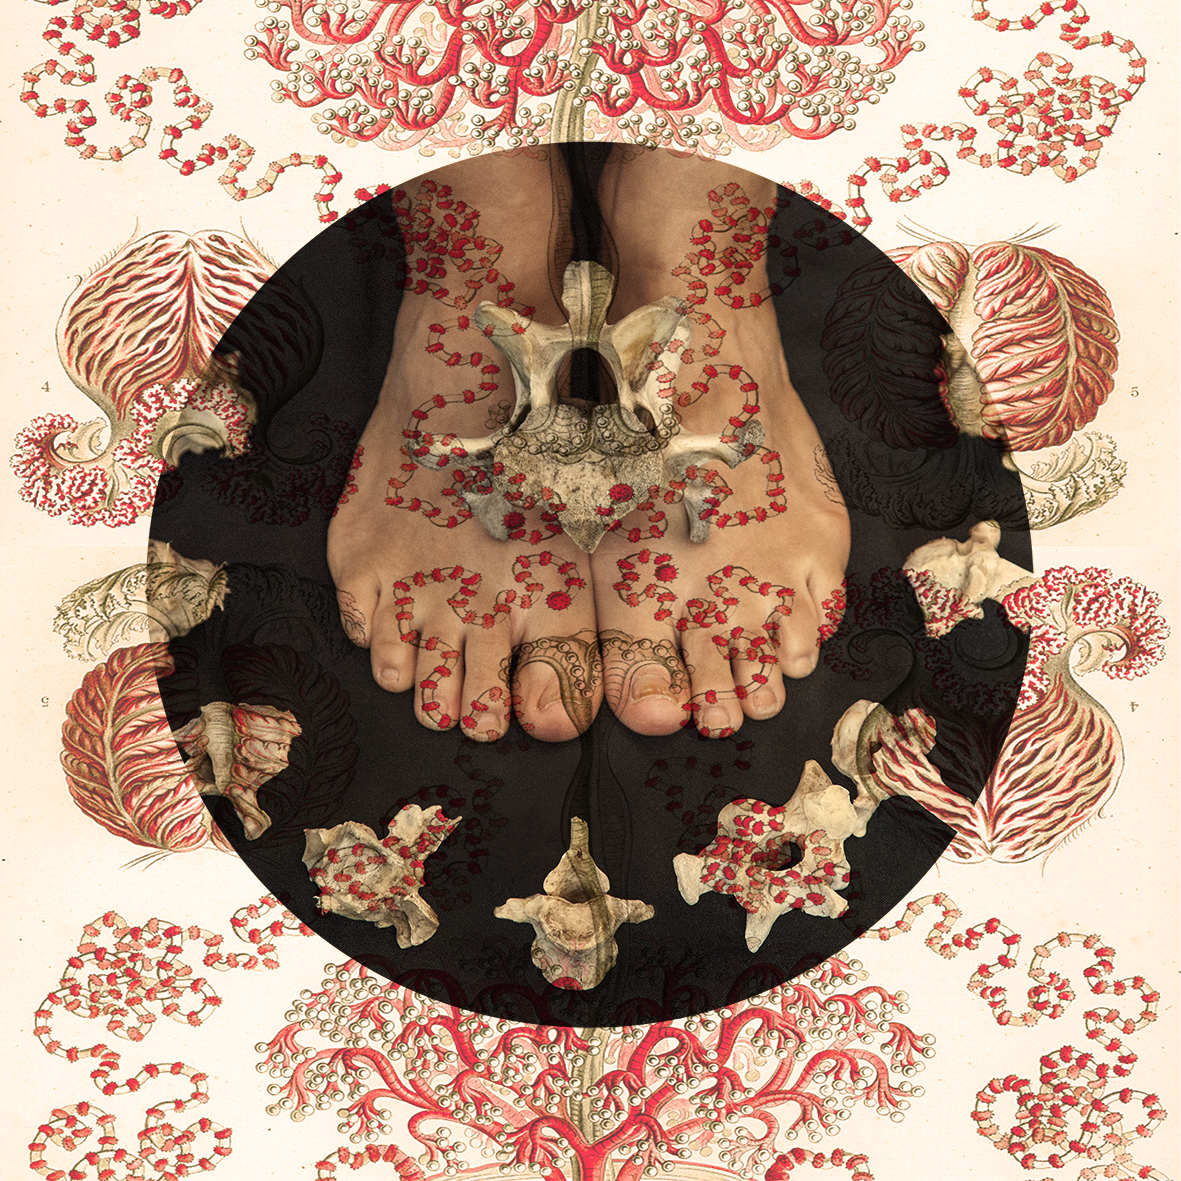 "Fotografia de la artista Tatiana Parcero, transferida en madera ""Kiri"". Medidas: 20x20 cm."